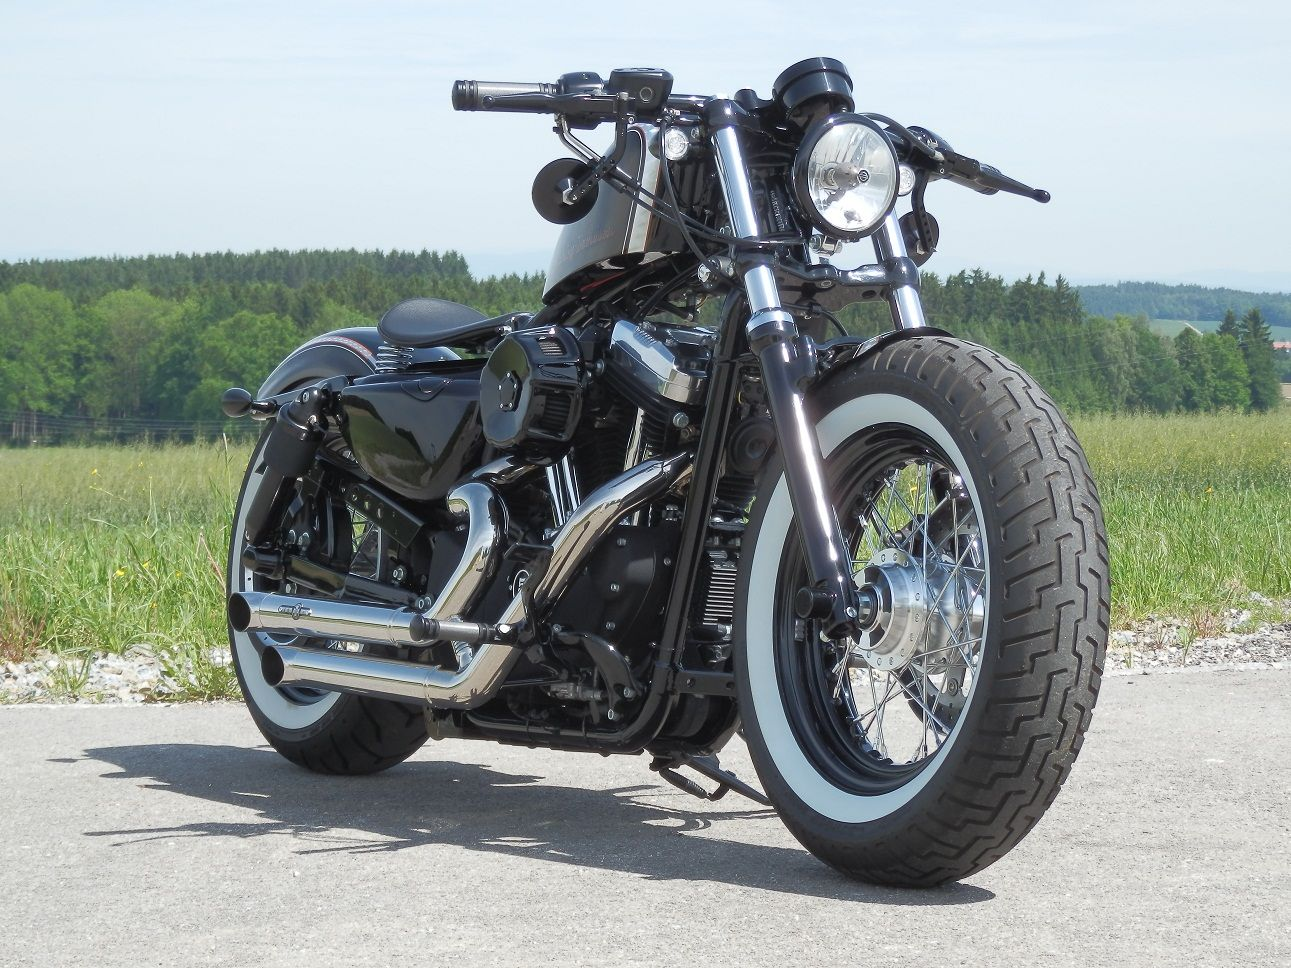 Harley Davidson: Community & Infos über Harley